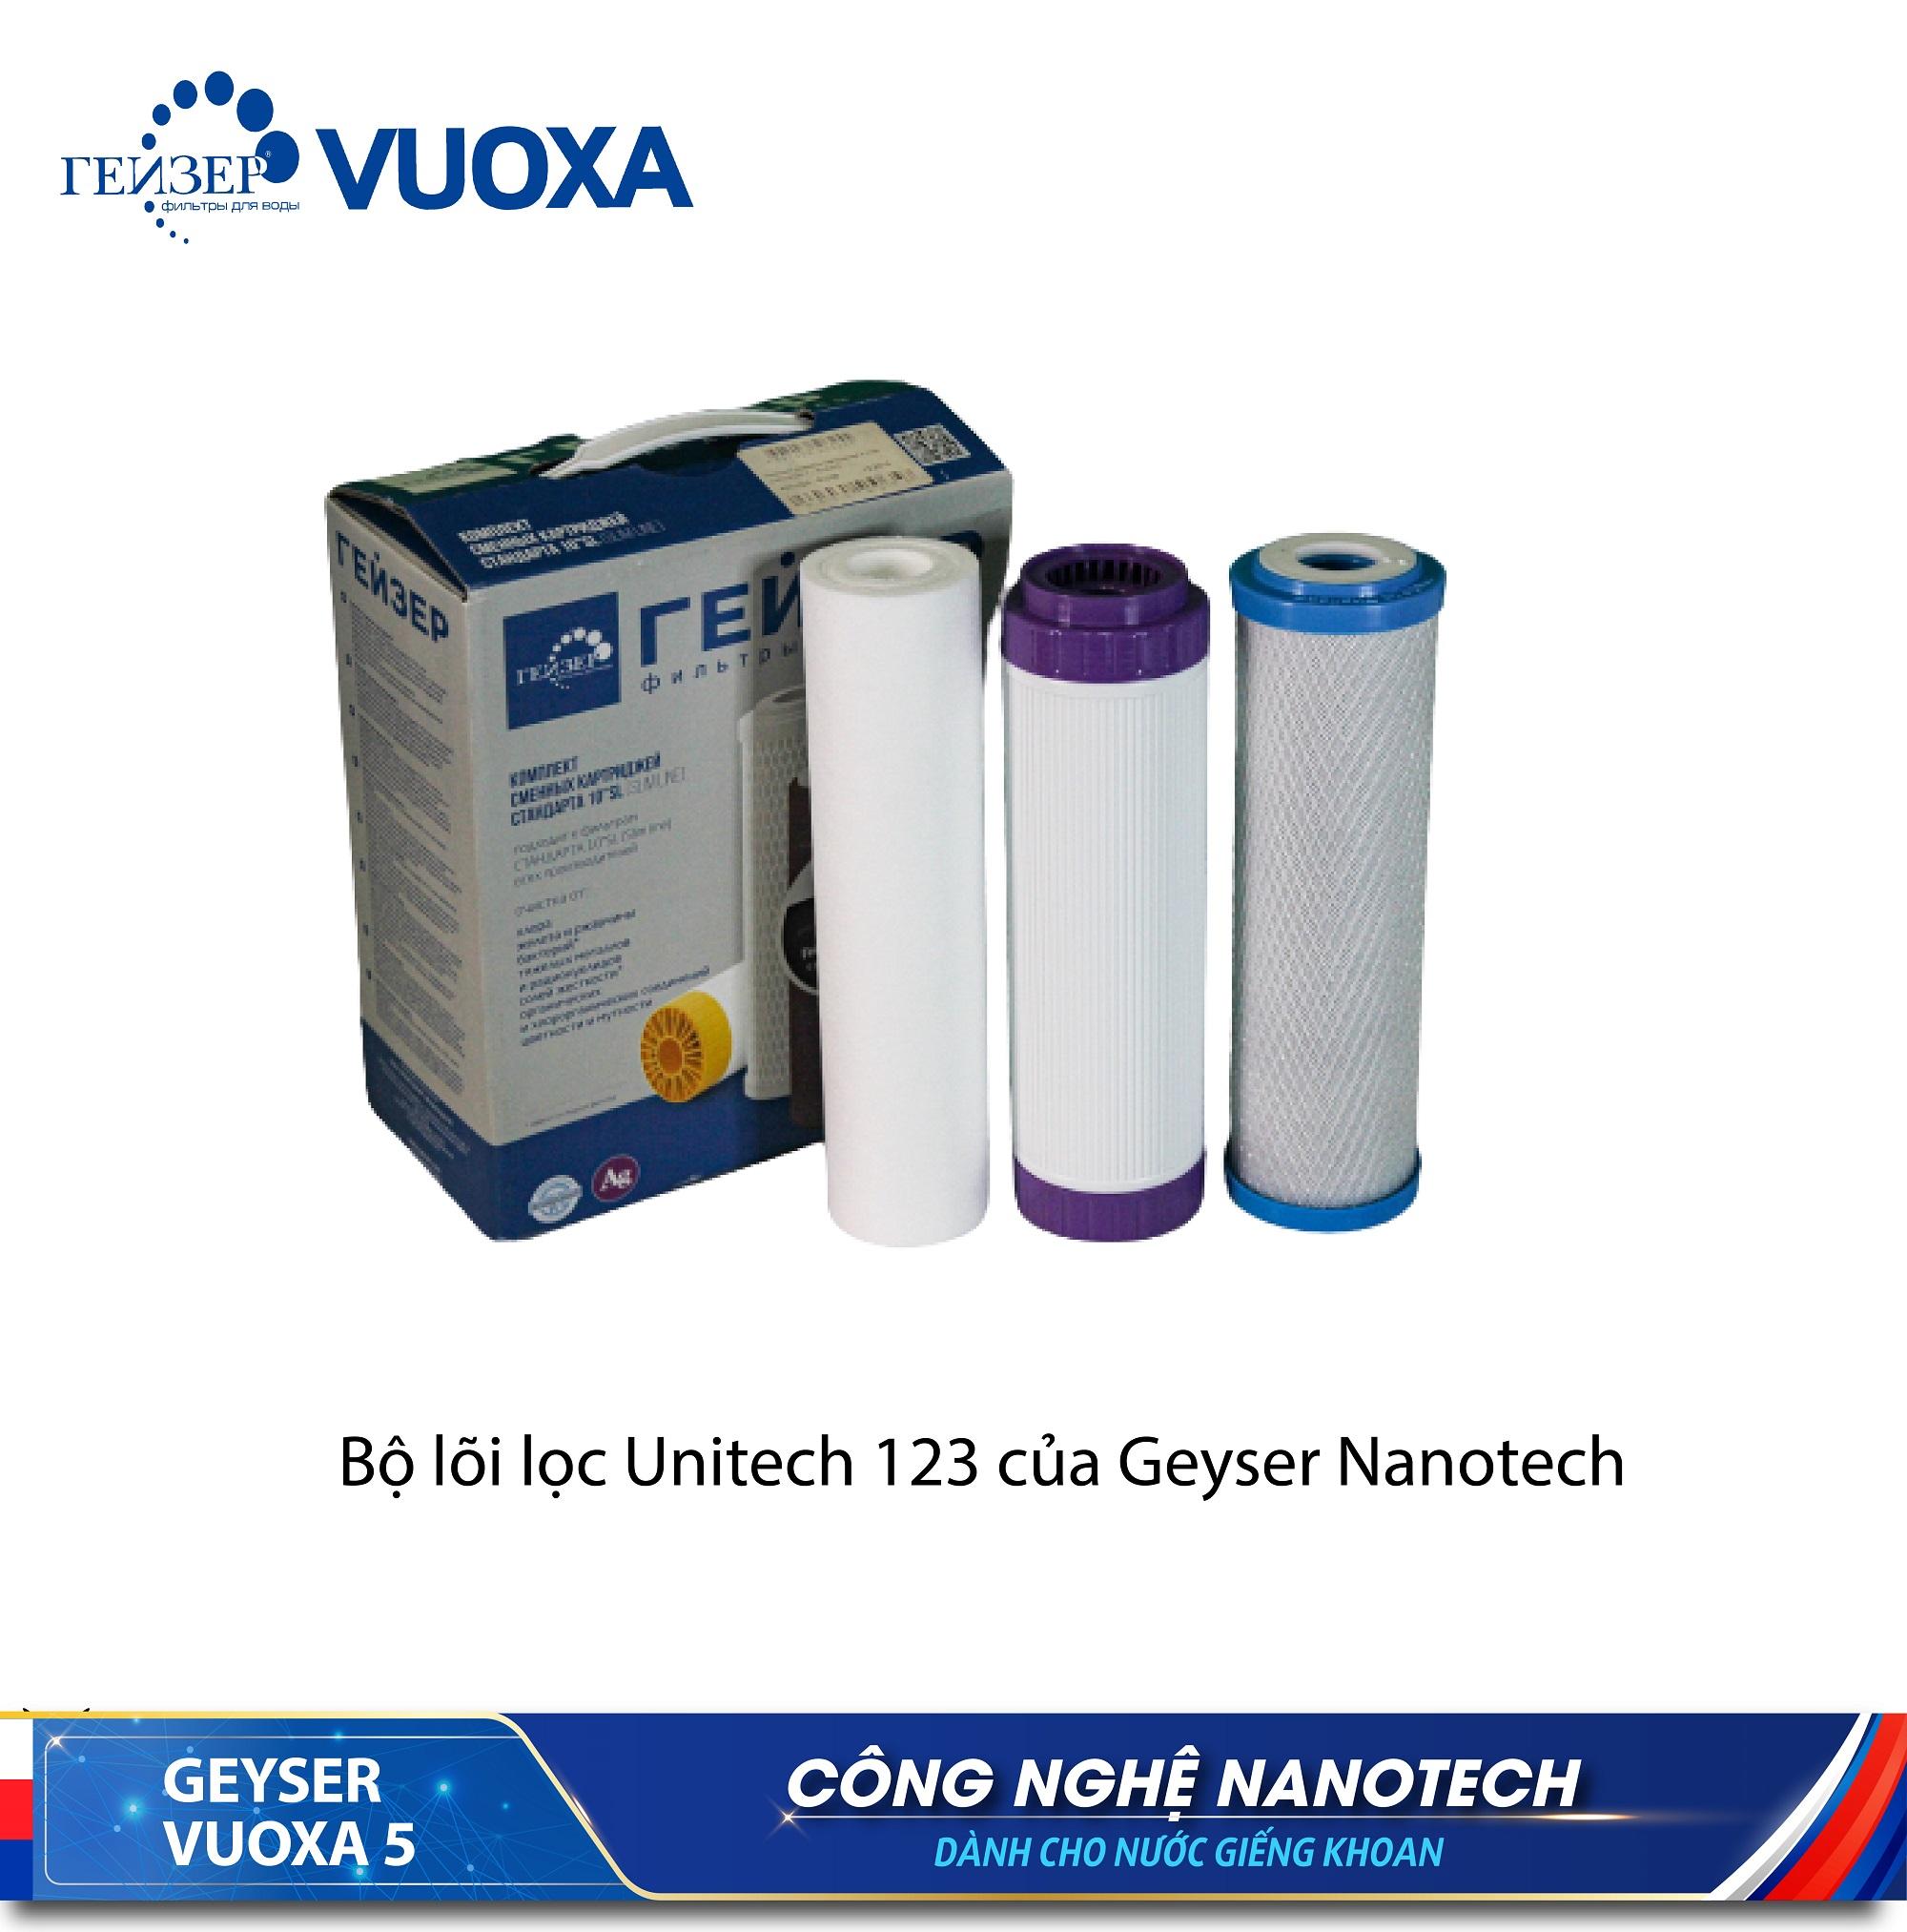 Bộ 3 lõi lọc 123 UniTech 5 in 1 Máy lọc nước ion canxi Geyser Vuoxa 5